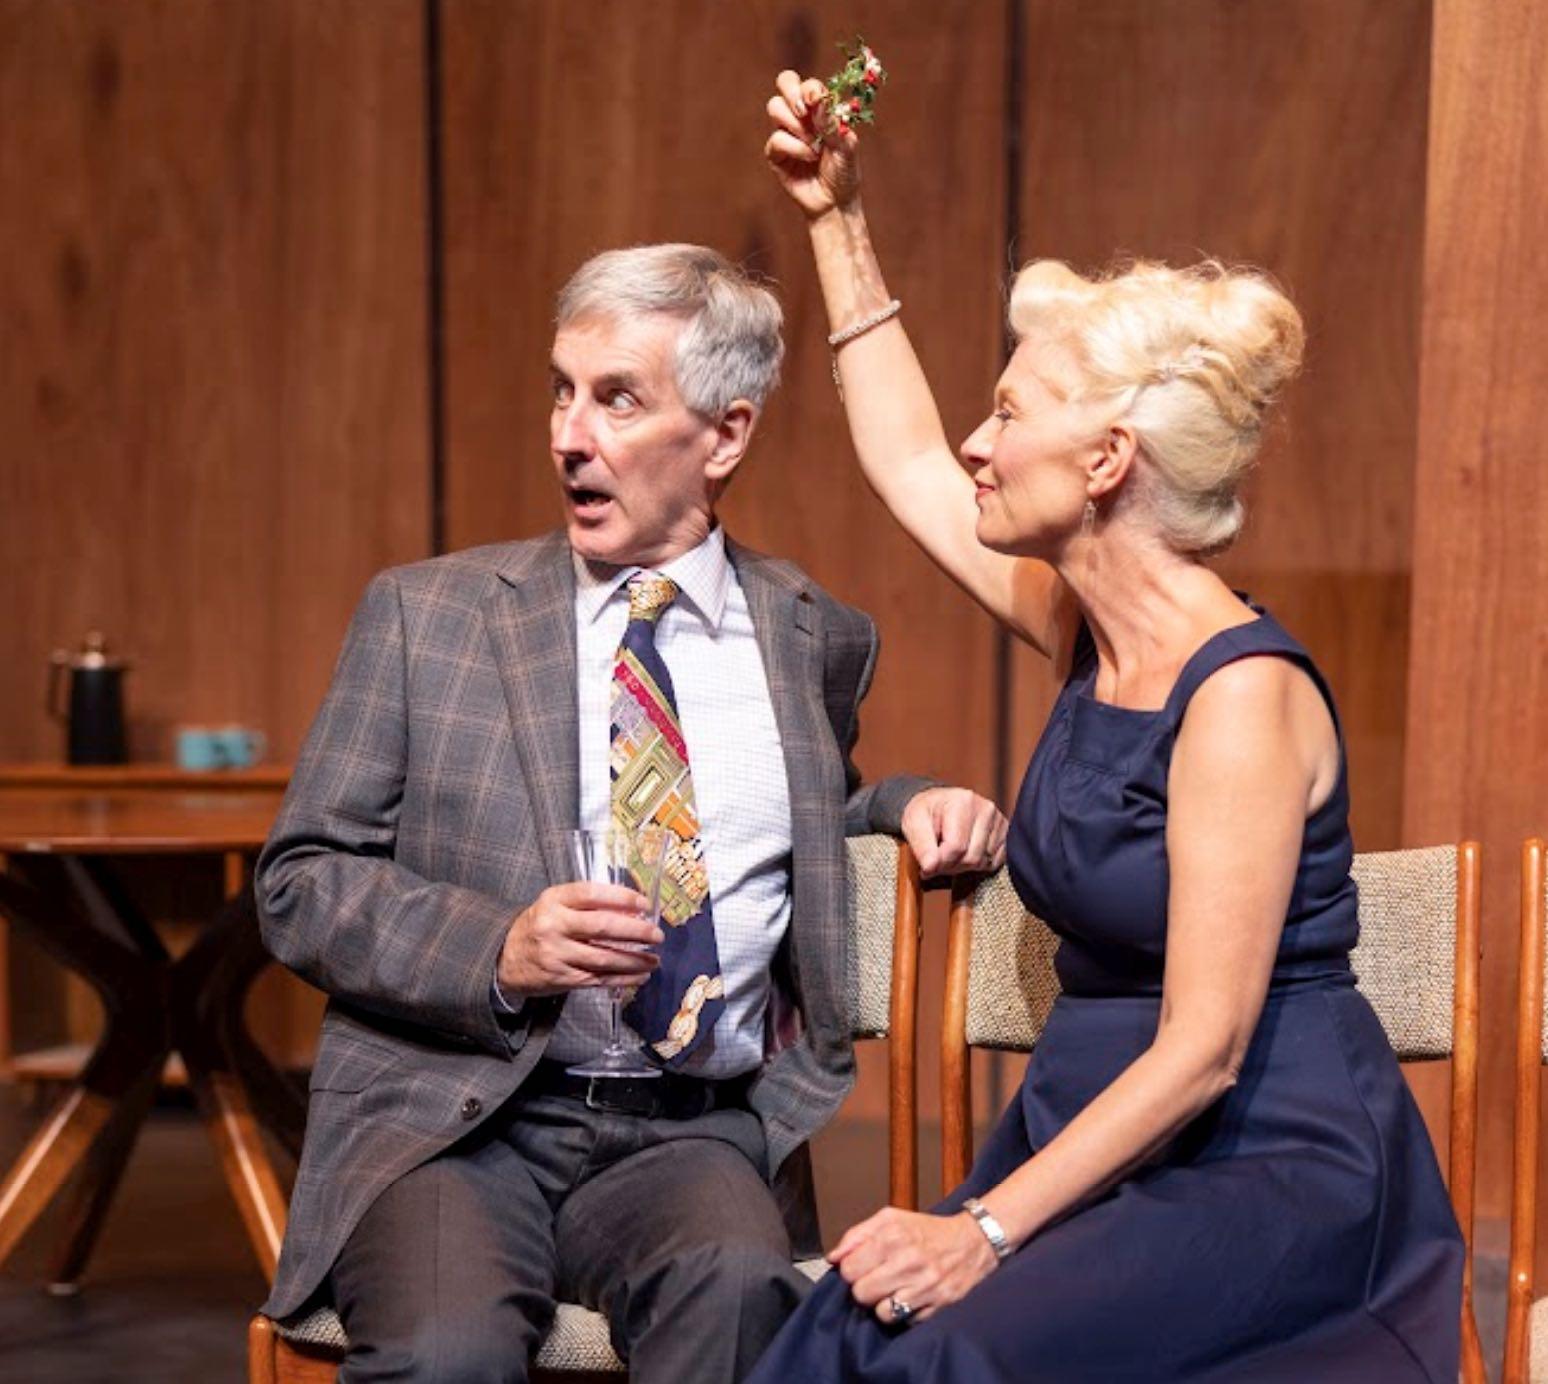 Old Love actors omn stage in Orillia